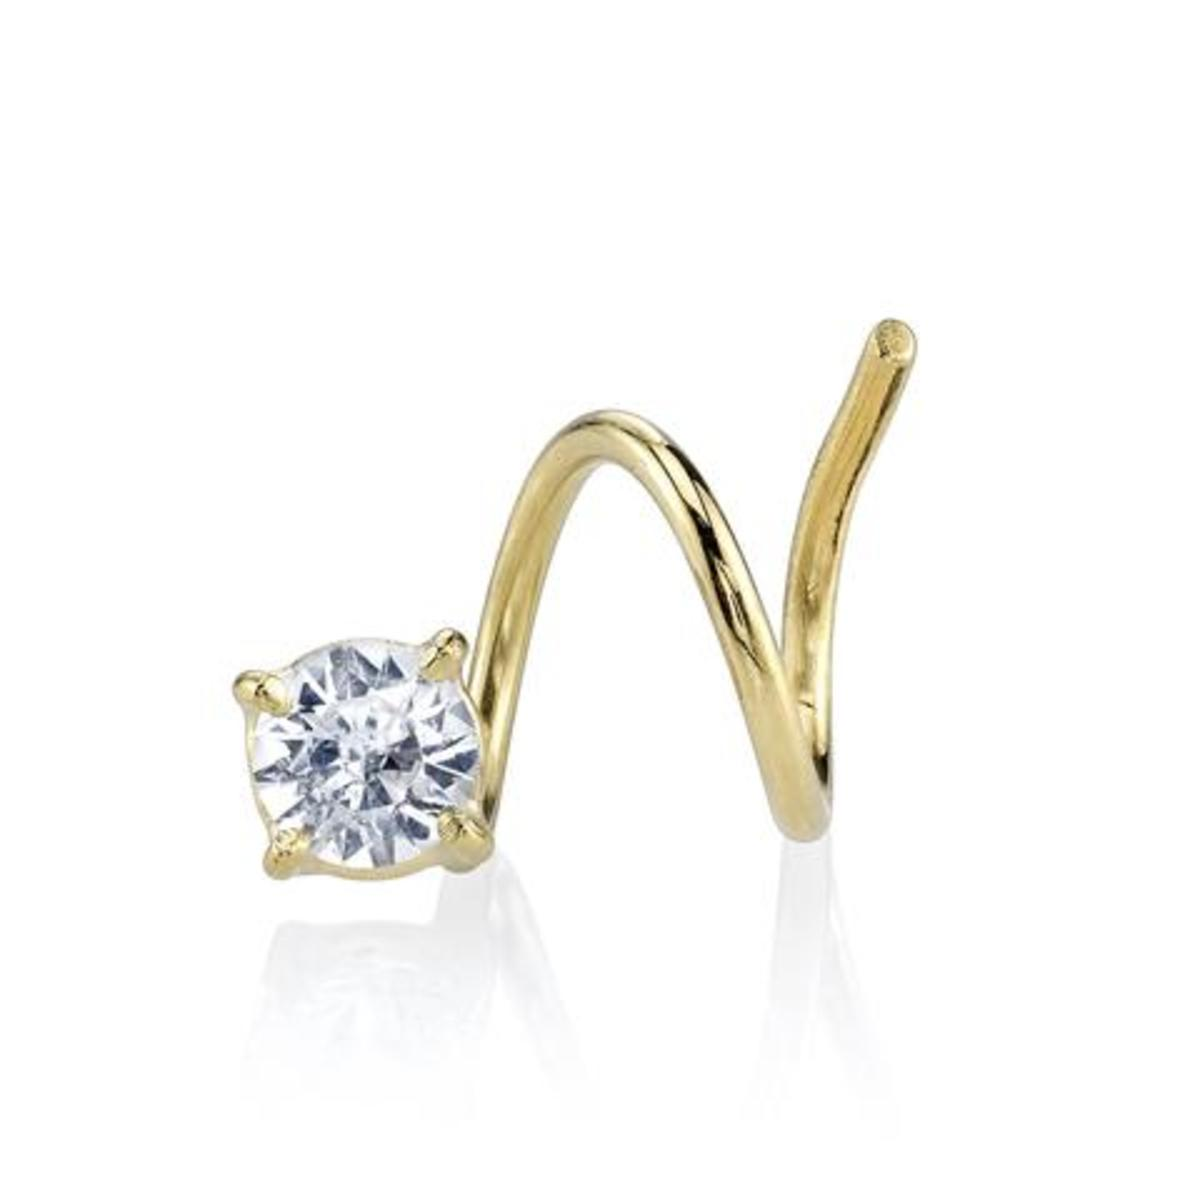 Smith & Mara White Sapphire Round Spiral Earring, $190, available at SmithandMara.com.